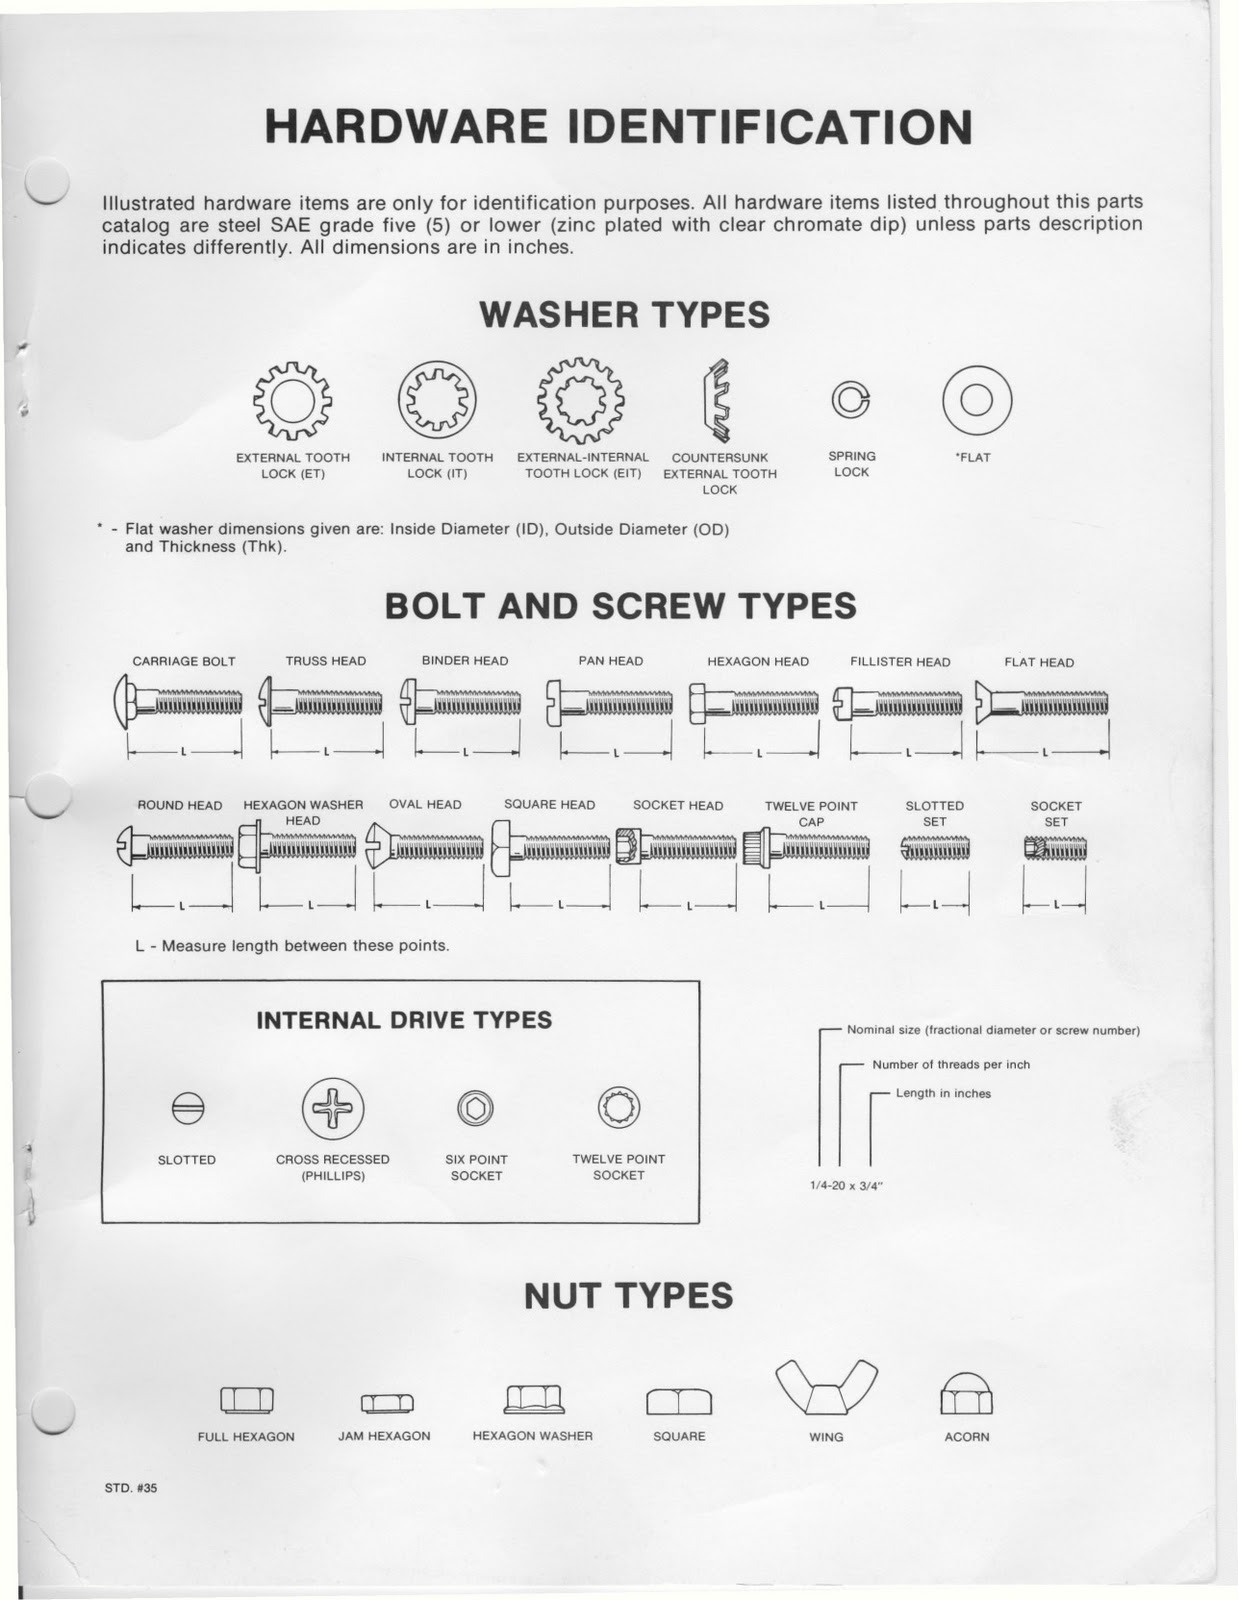 6000 onan rv generator wiring diagram onan 6000 watt generator wiring diagram generator onan wiring circuit [ 1238 x 1600 Pixel ]